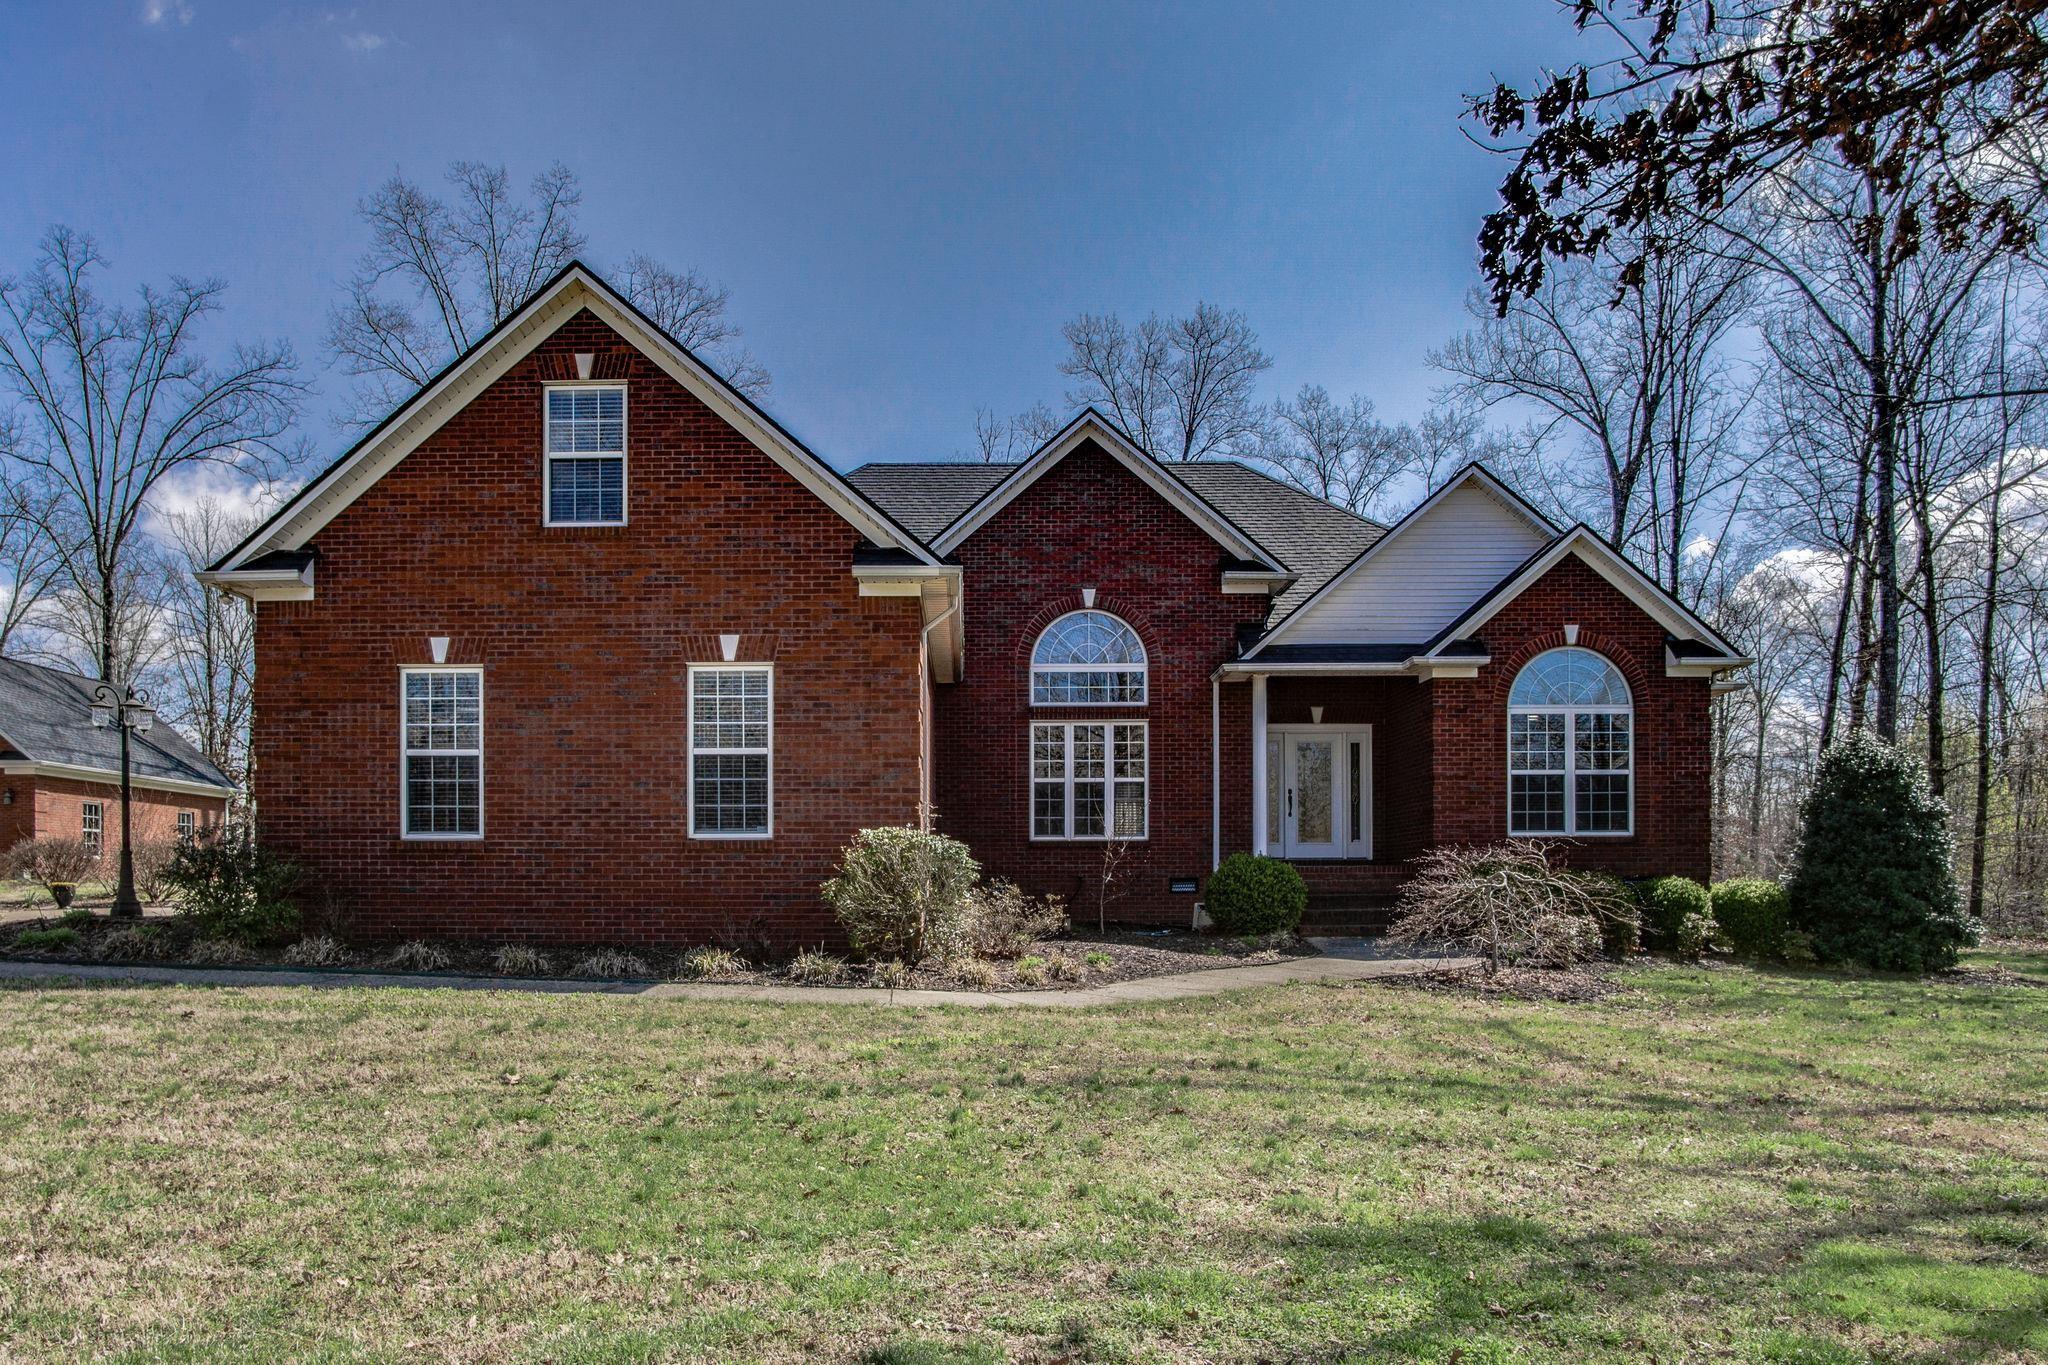 9 Will Ave, Lawrenceburg, TN 38464 - Lawrenceburg, TN real estate listing